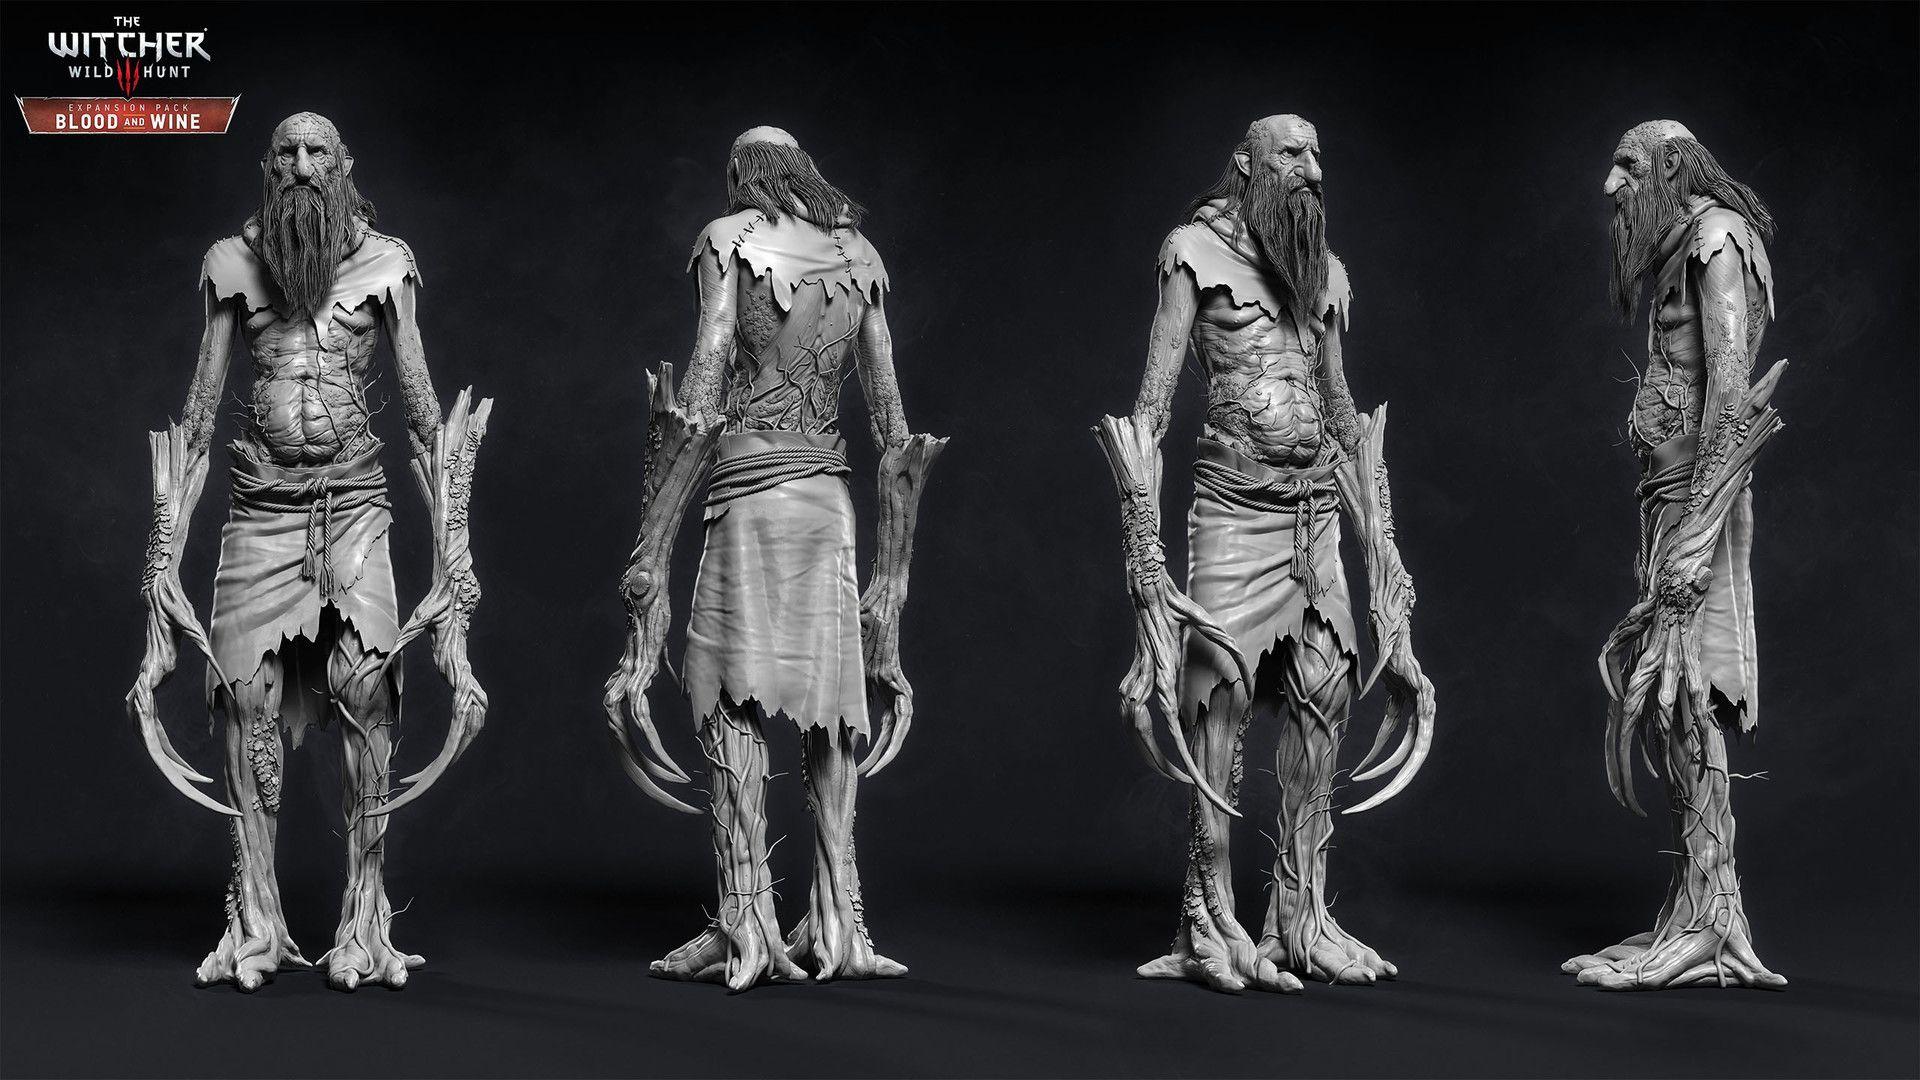 ArtStation - The Witcher III - Spriggan, Marcin Blaszczak